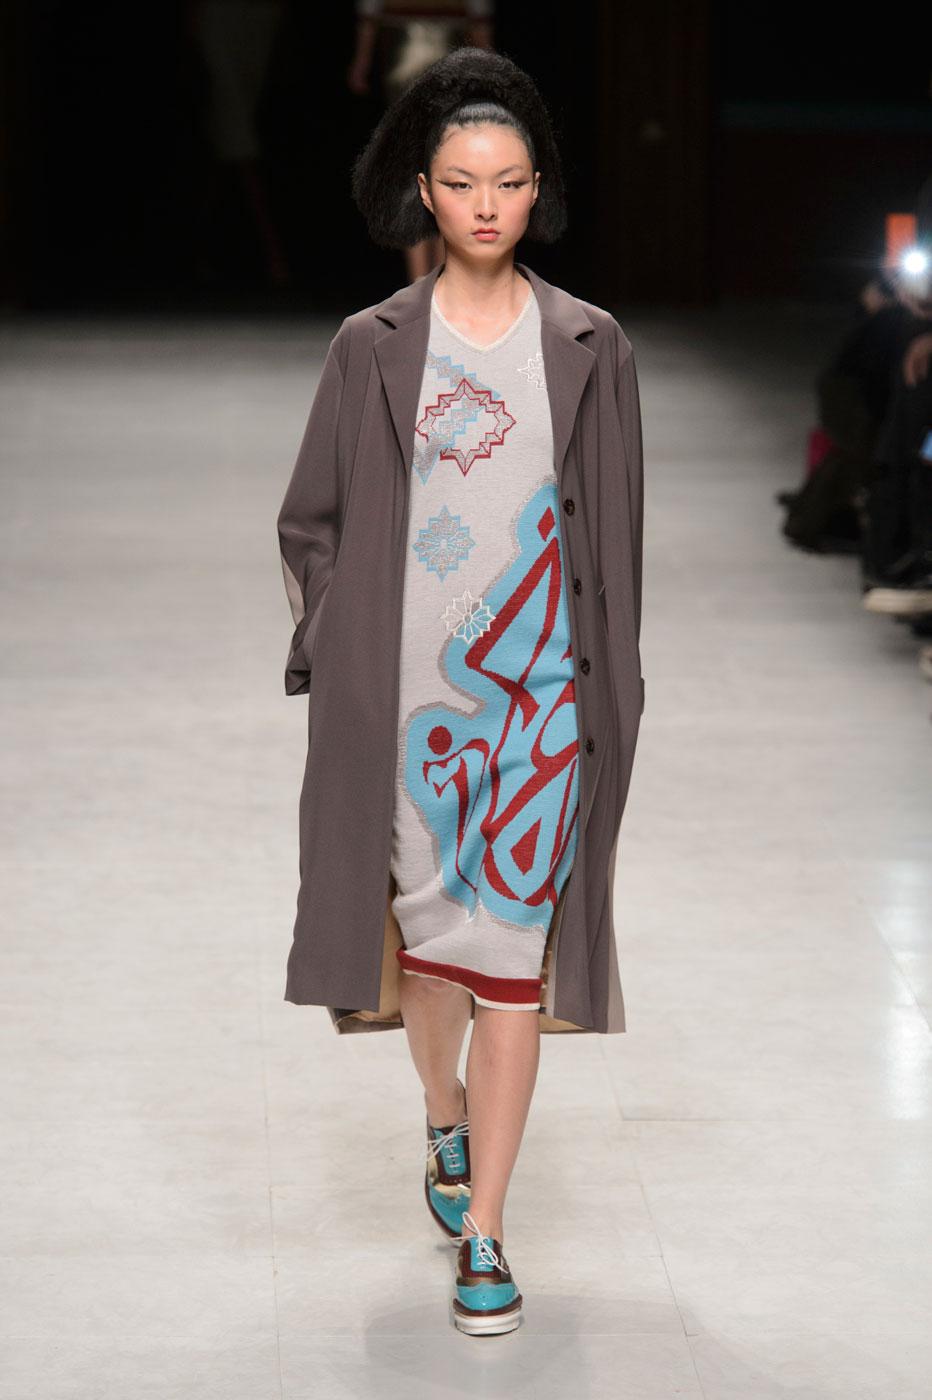 Julien-Fournie-Prive-fashion-runway-show-haute-couture-paris-spring-2015-the-impression-12